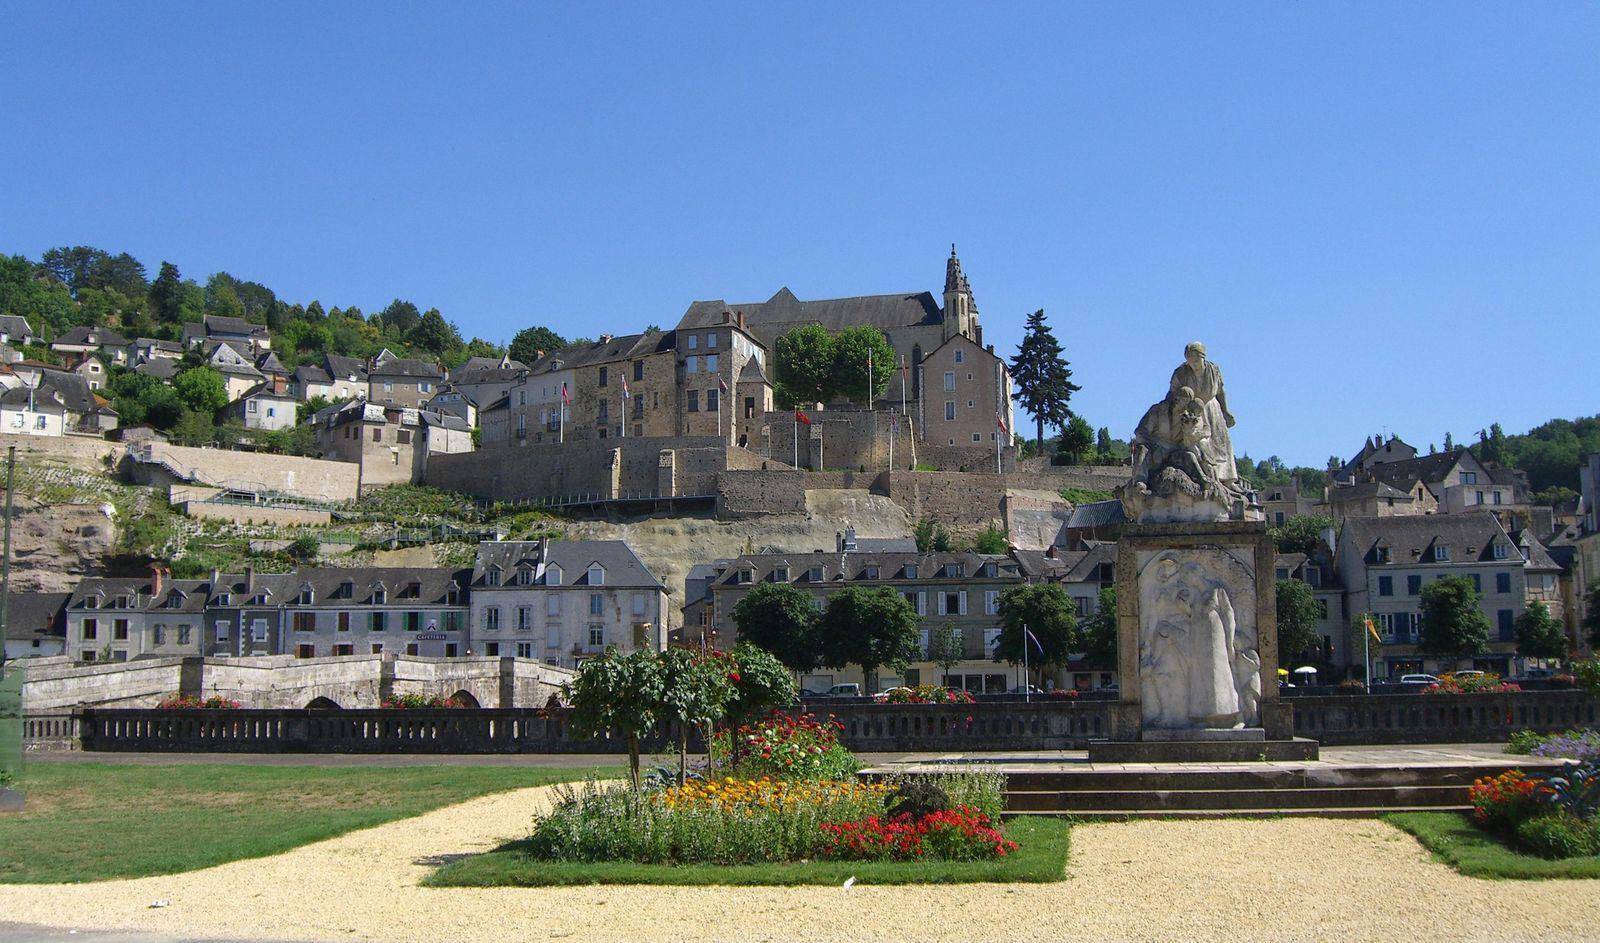 Image : Office de Tourisme* de Terrasson-Lavilledieu